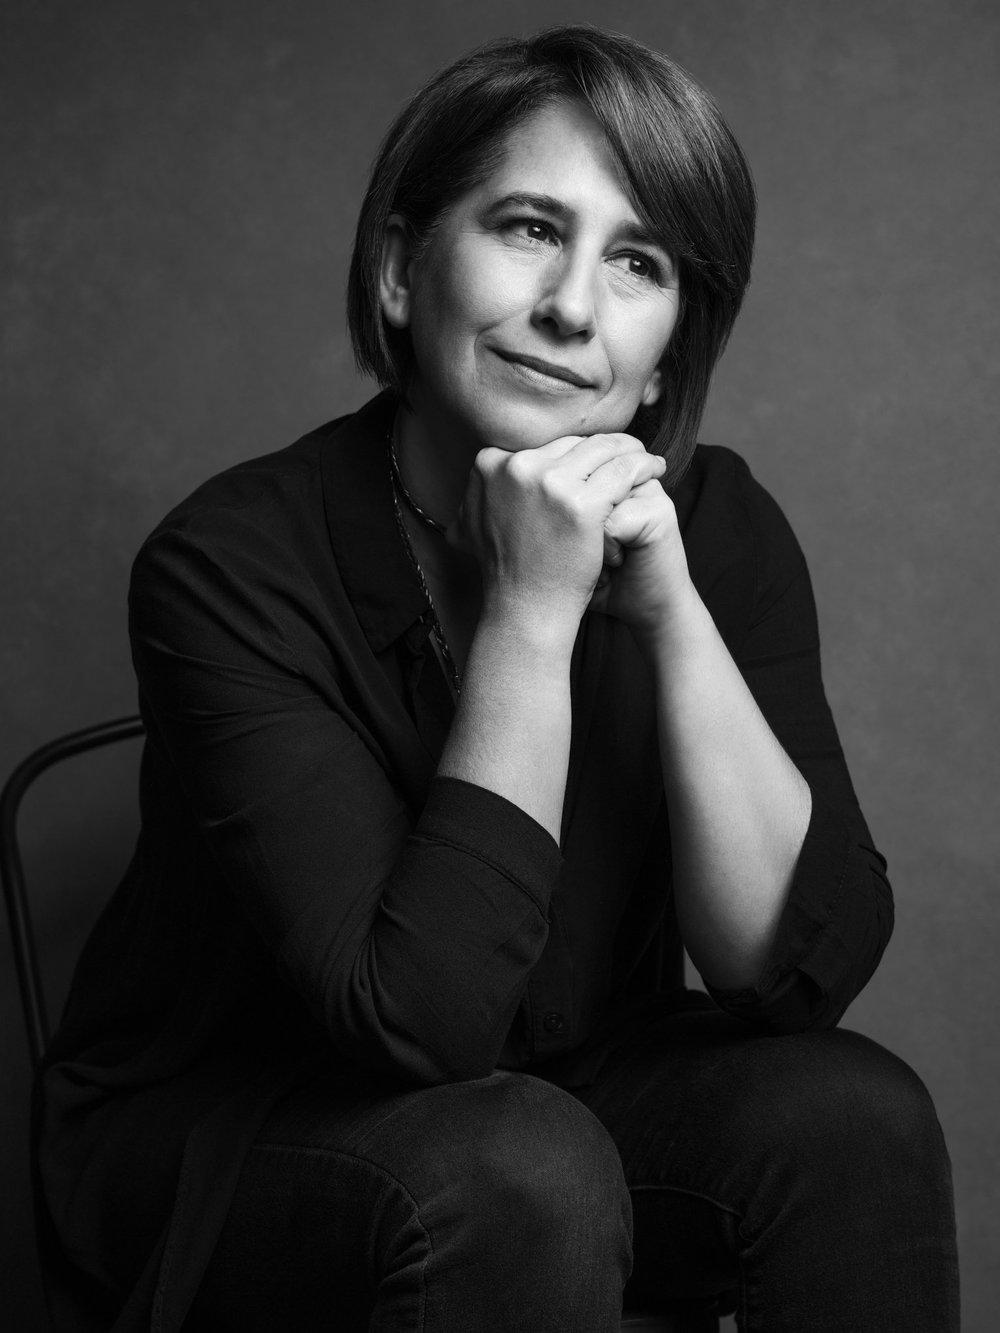 Maria Pacheco - Founder of Wakami